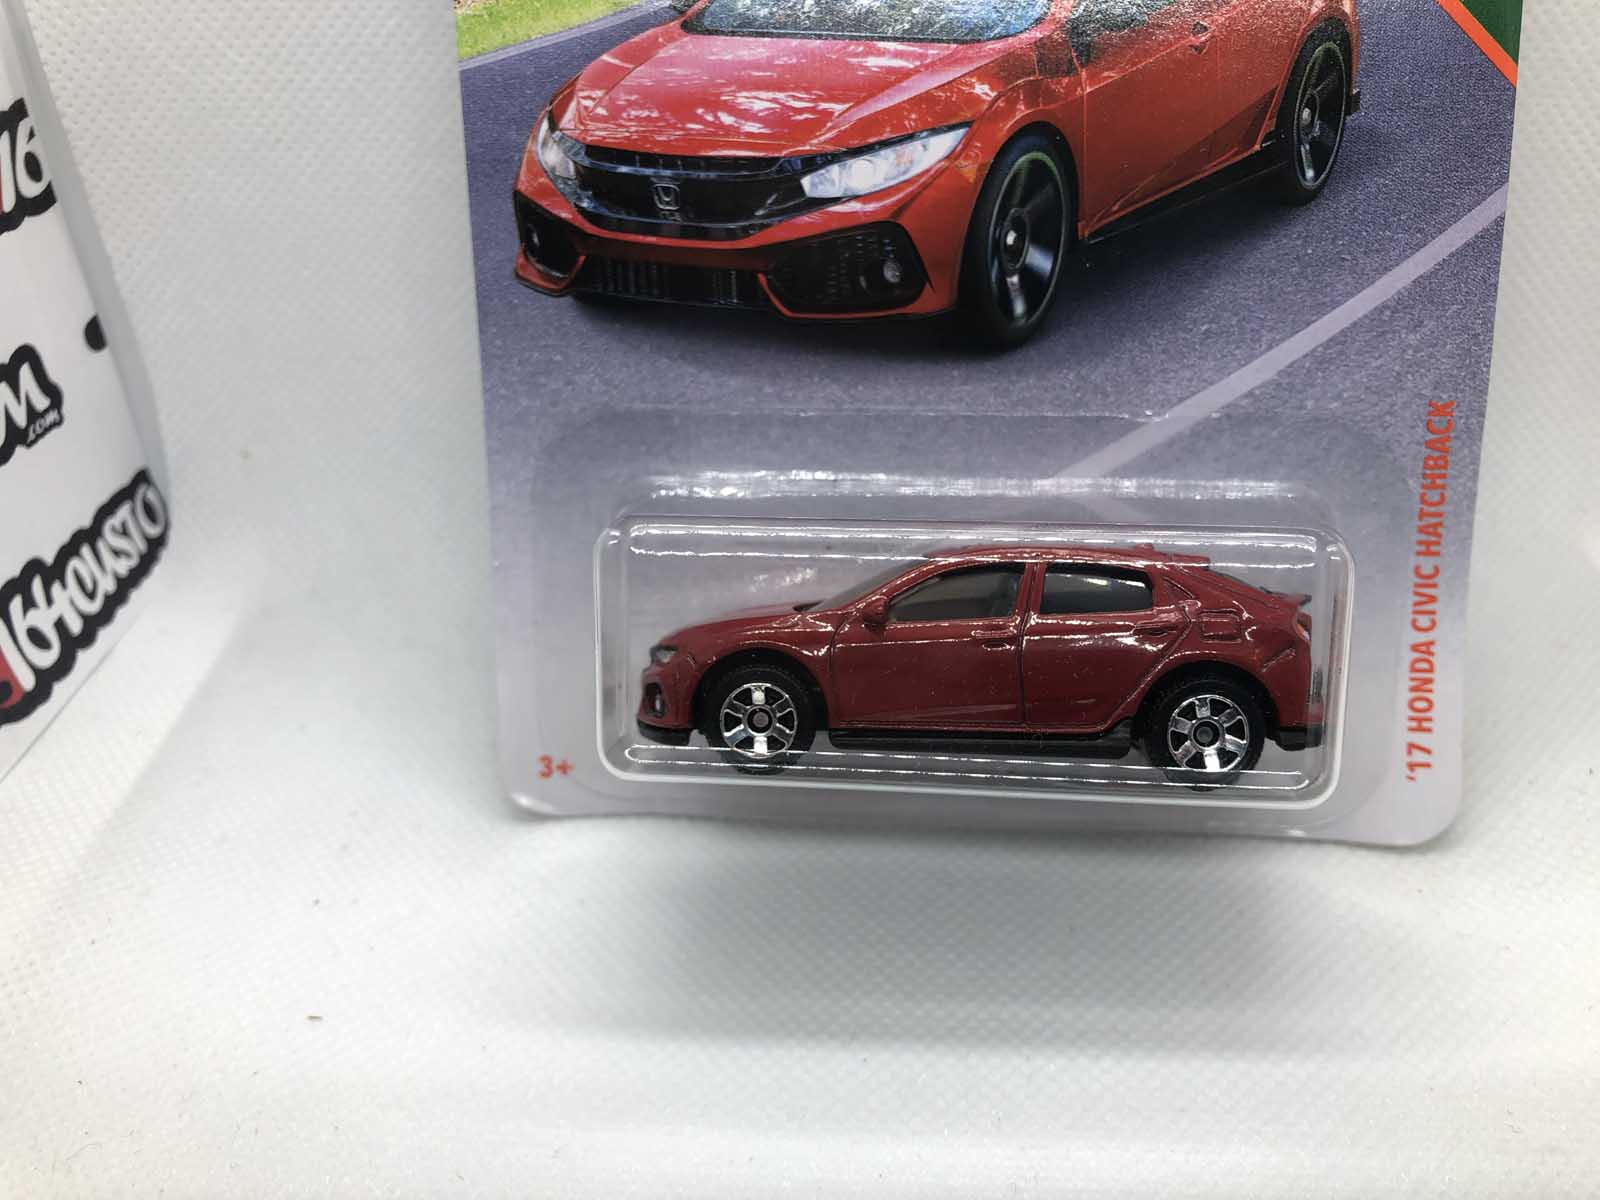 17 Honda Civic Hatchback